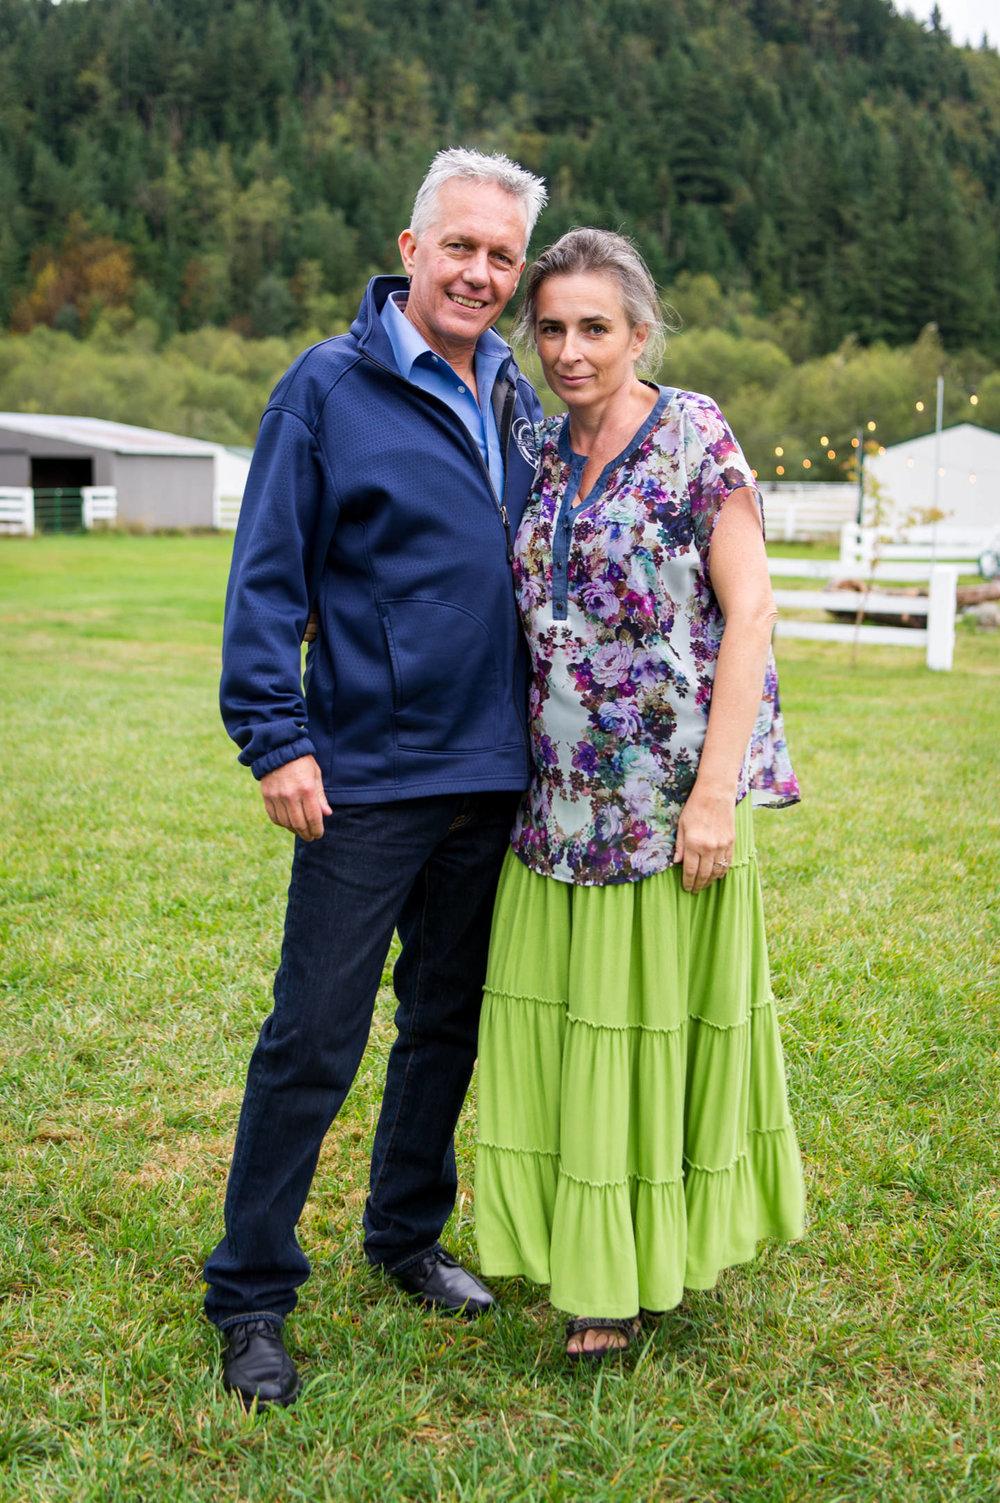 20160917_Tat_Renee and Marcus Wedding-76.jpg